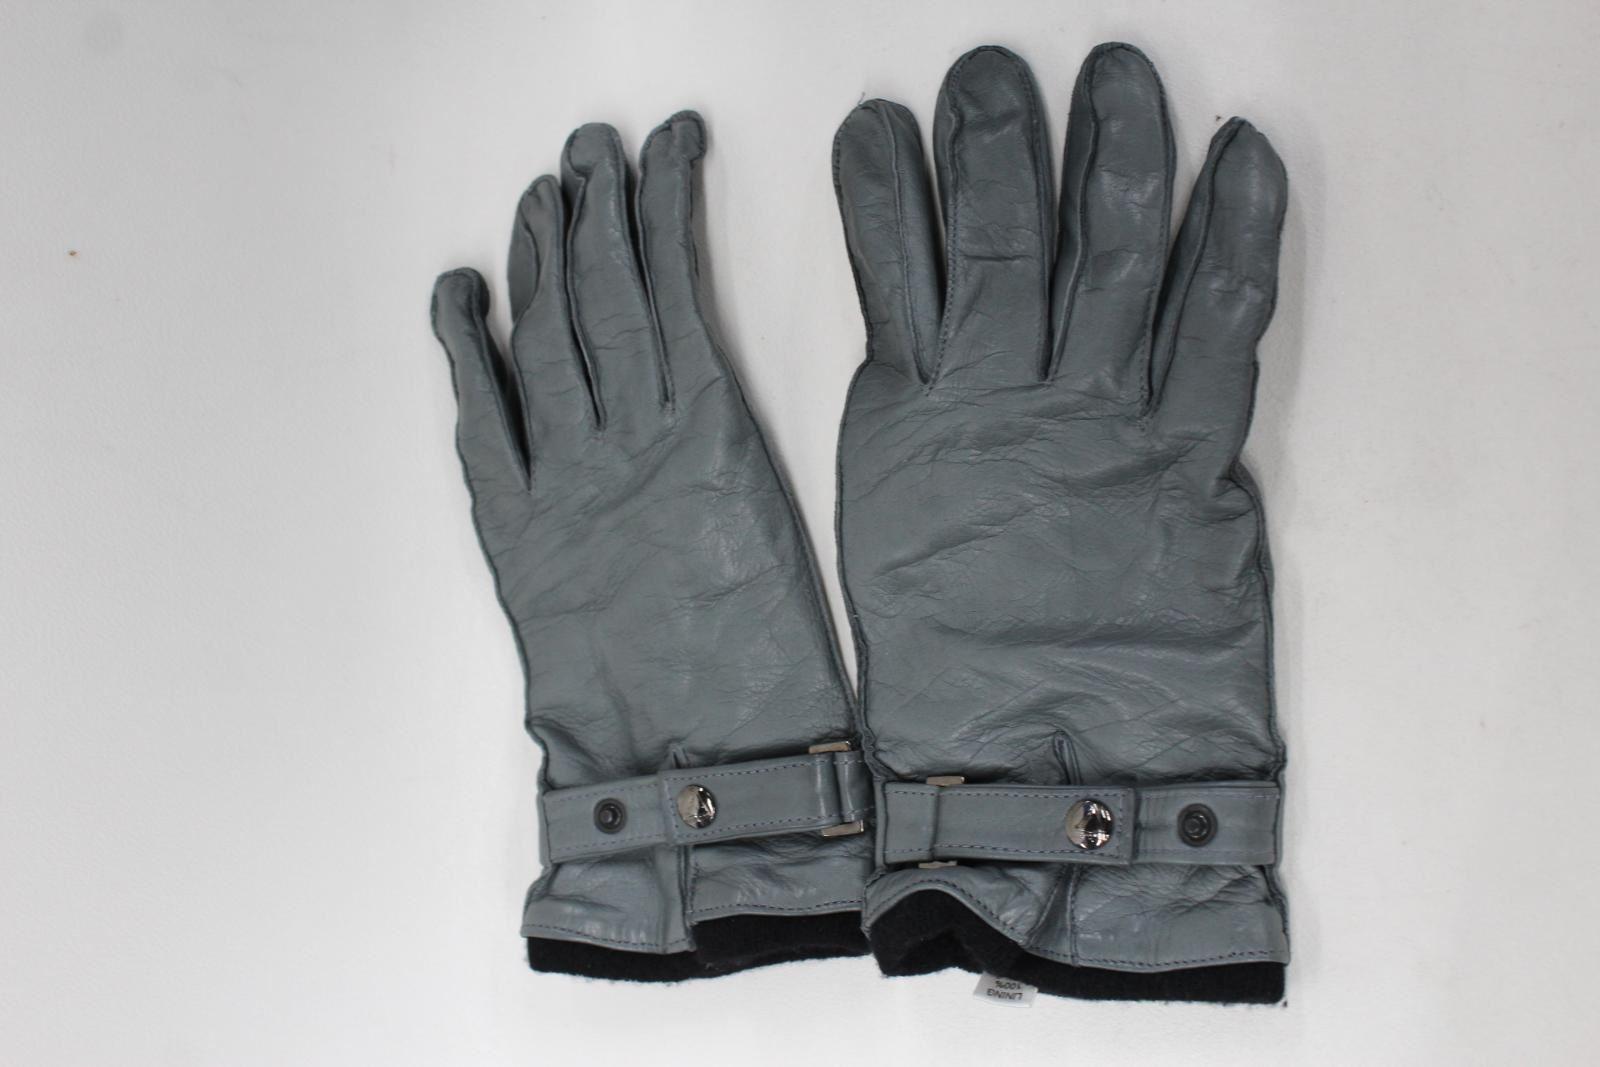 ASPINAL-OF-LONDON-Men-039-s-Grey-Leather-Cashmere-Adjustable-Wrist-Gloves-9-NEW